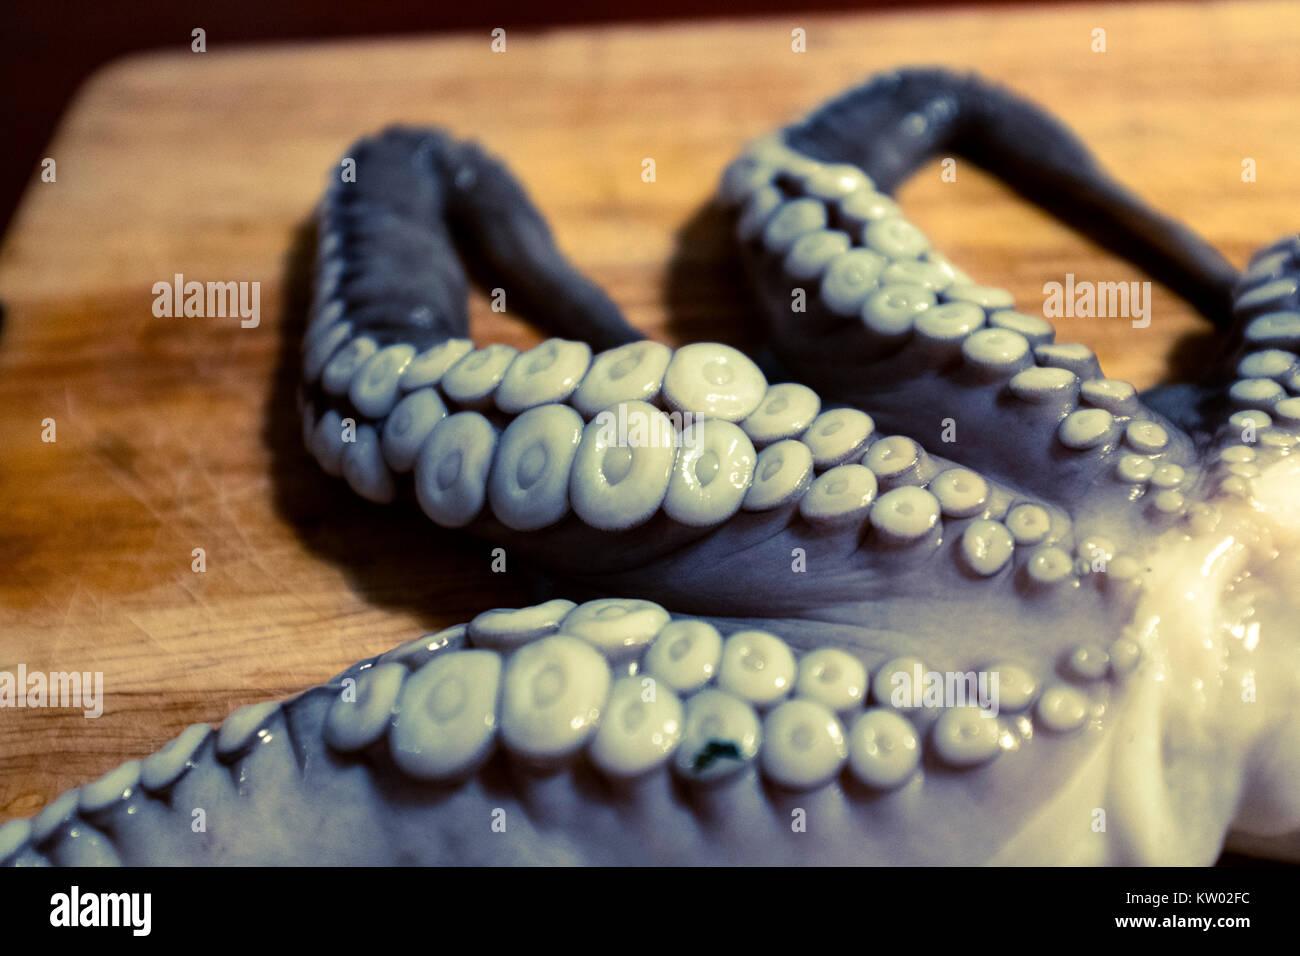 Do octopus have teeth